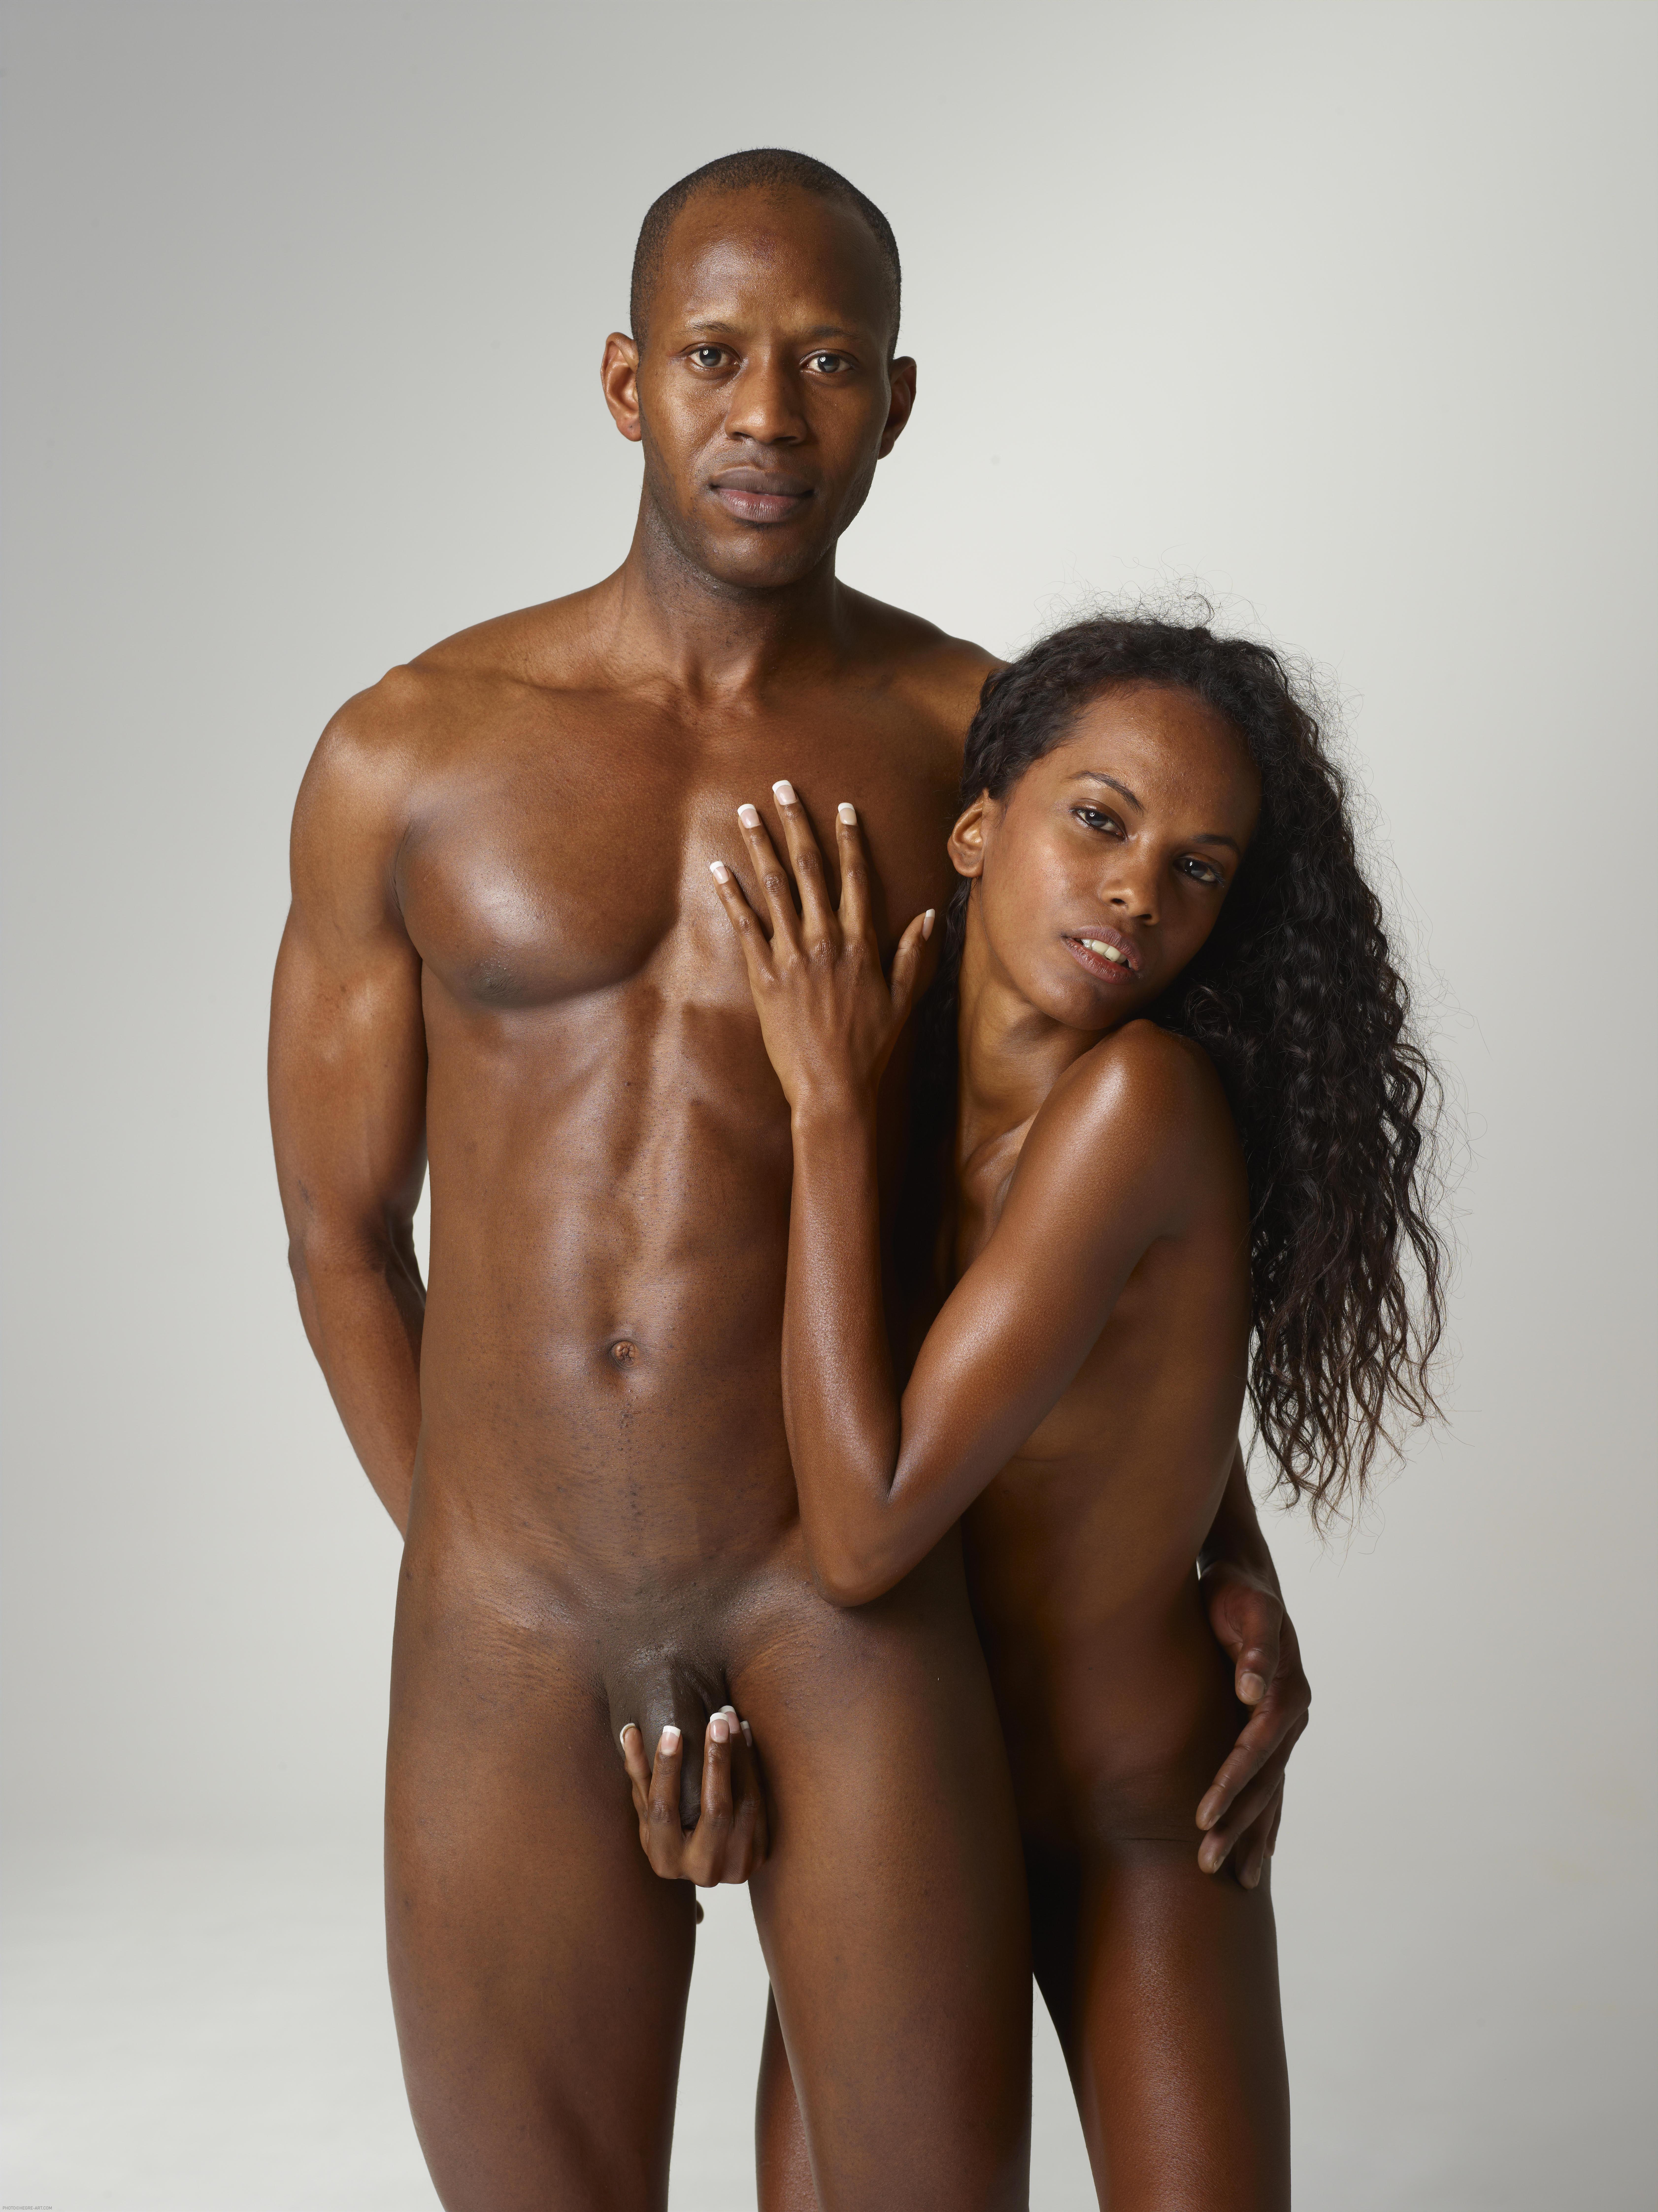 Oiled up black girl nude congratulate, simply